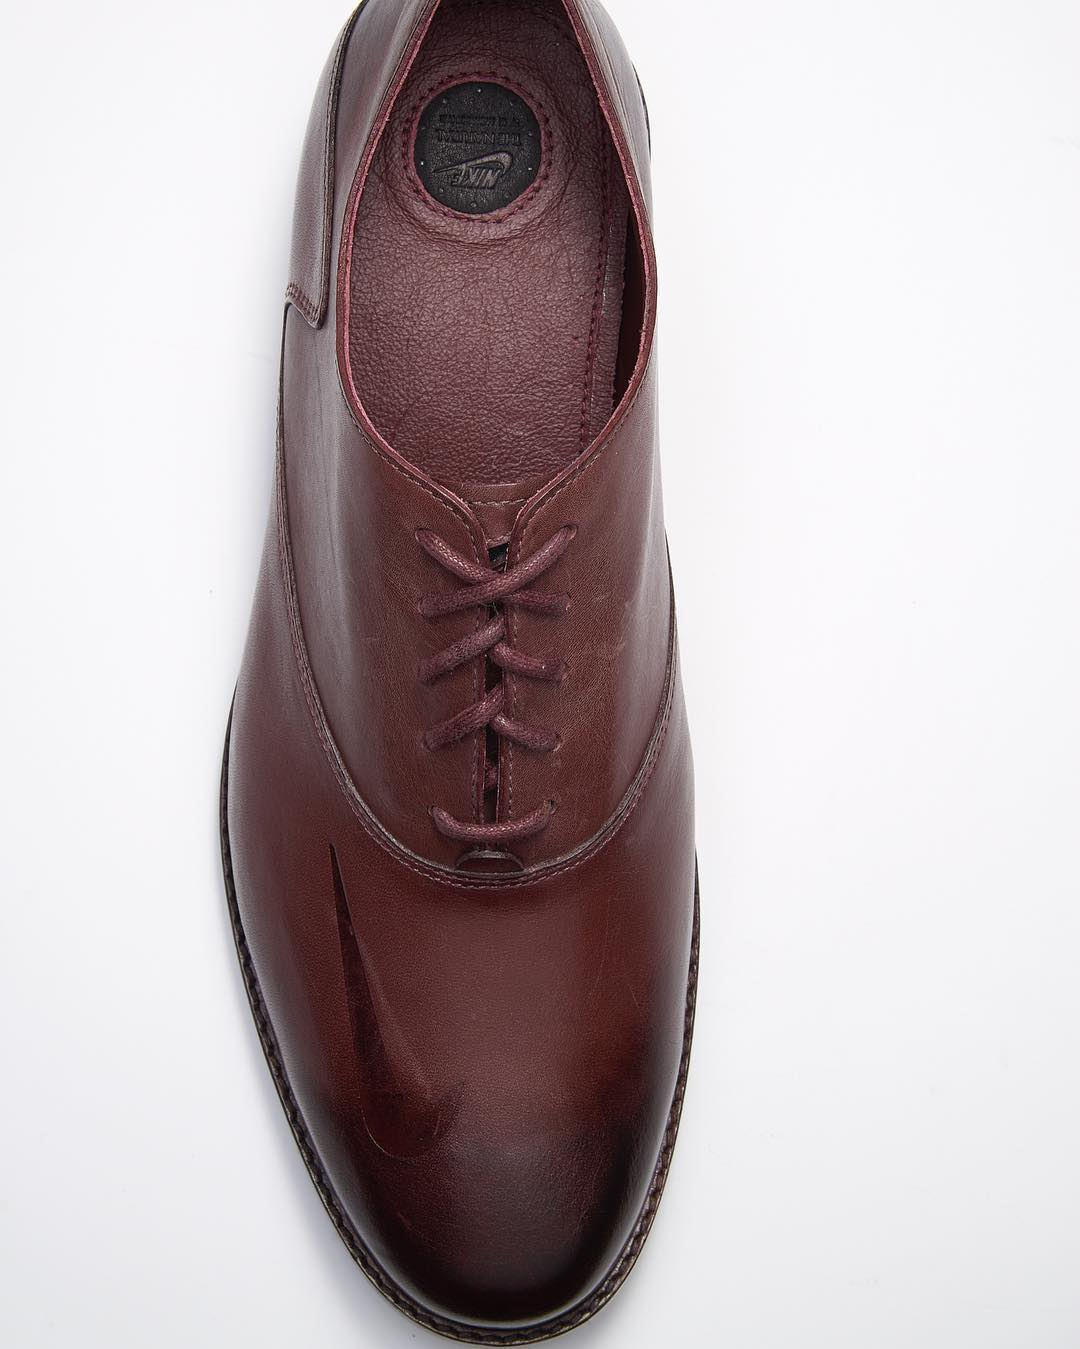 Nike dress shoes brown